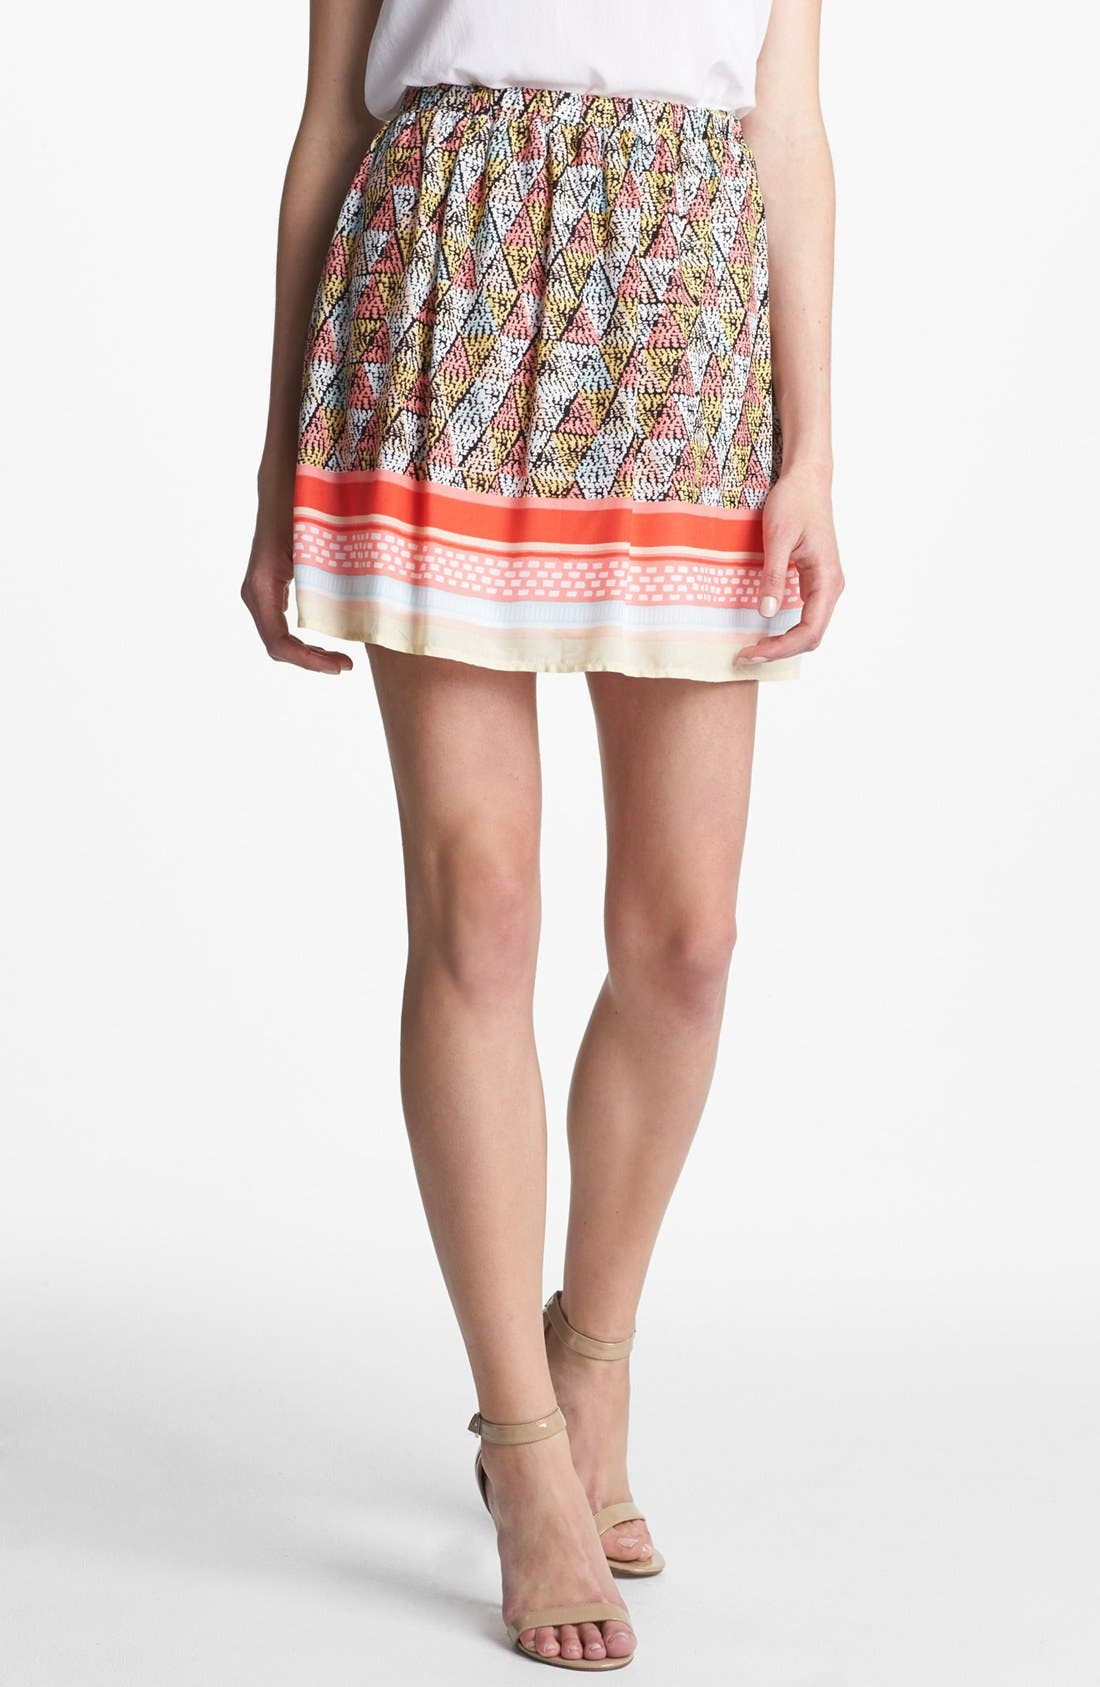 Alternate Image 1 Selected - Ella Moss 'Border' Print Skirt